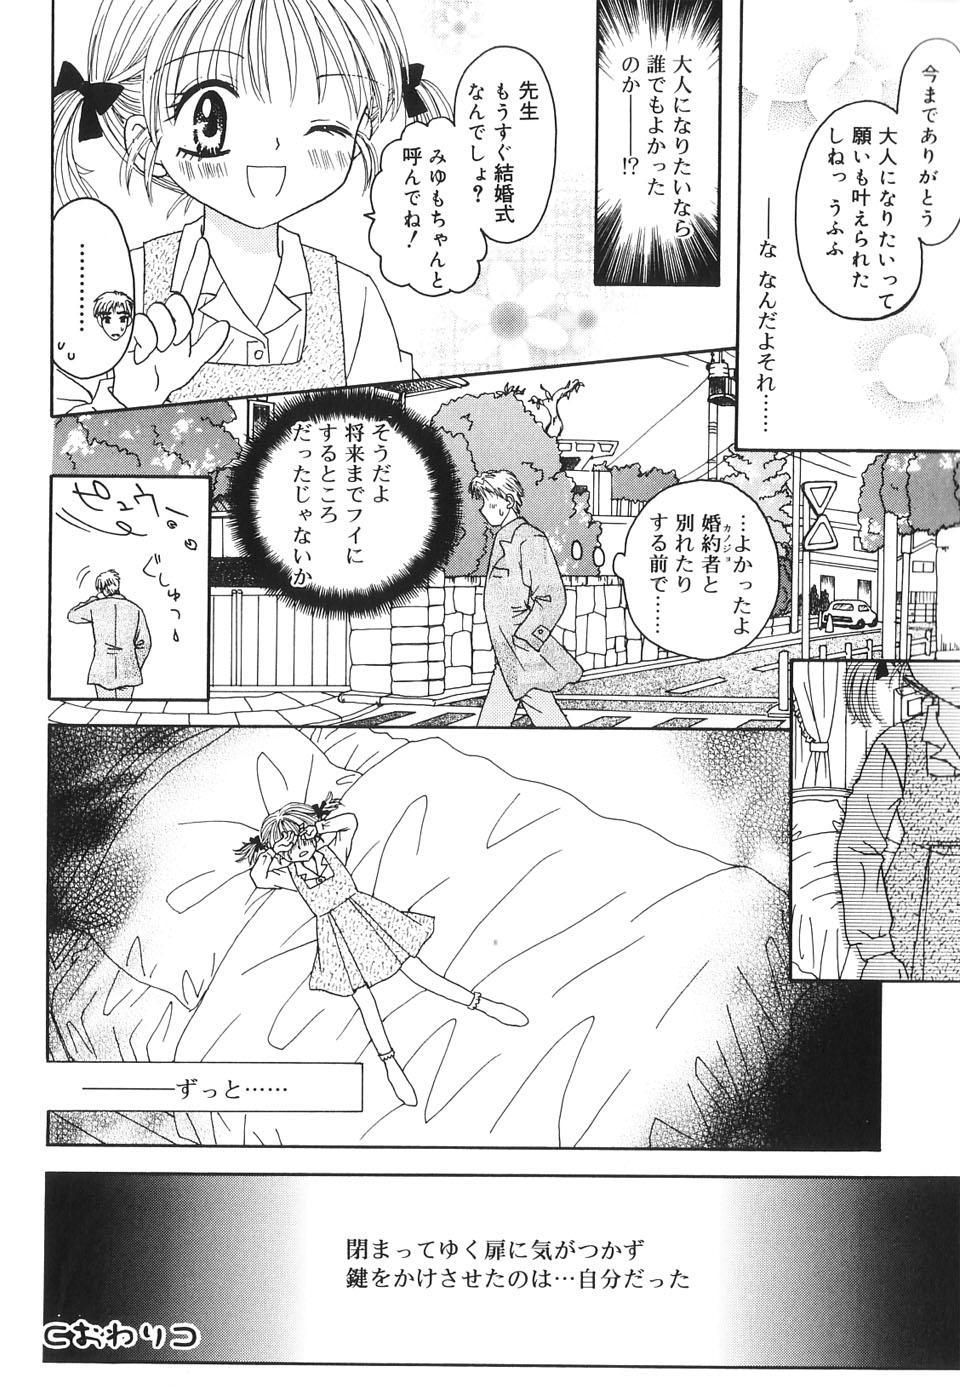 Musoubana 108